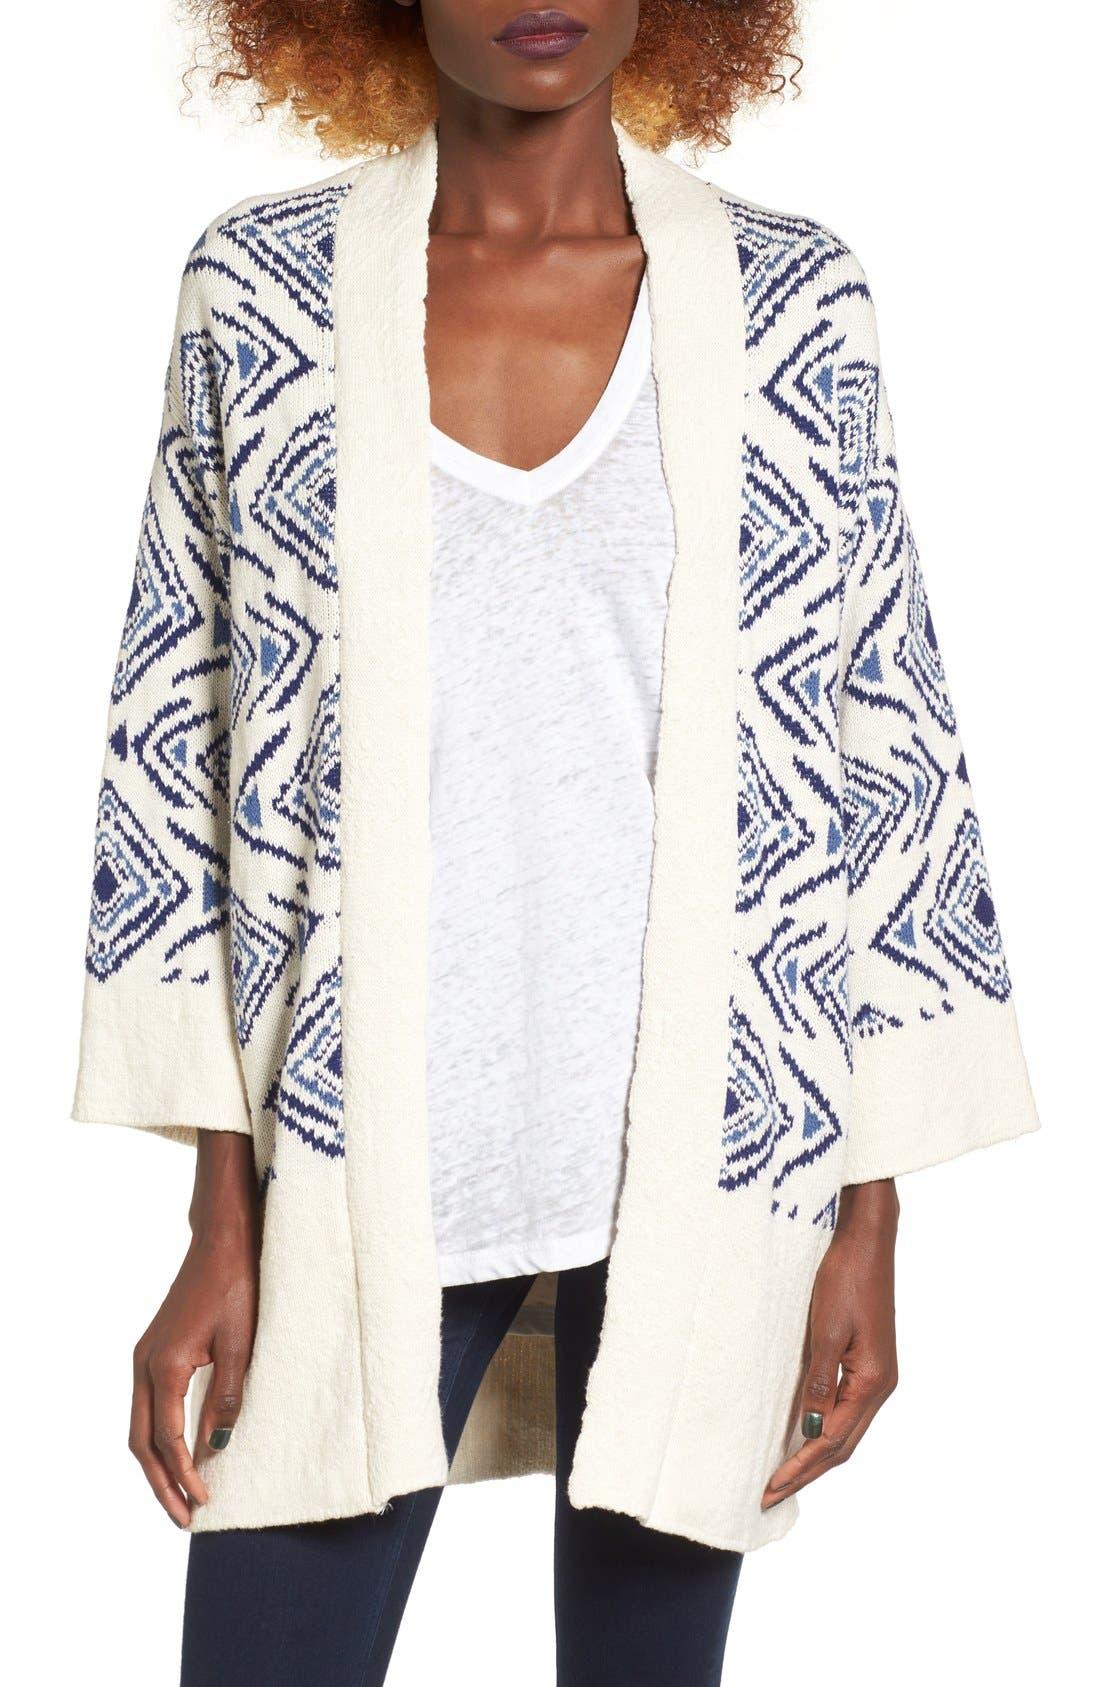 Main Image - Roxy Always Forever Kimono Cardigan